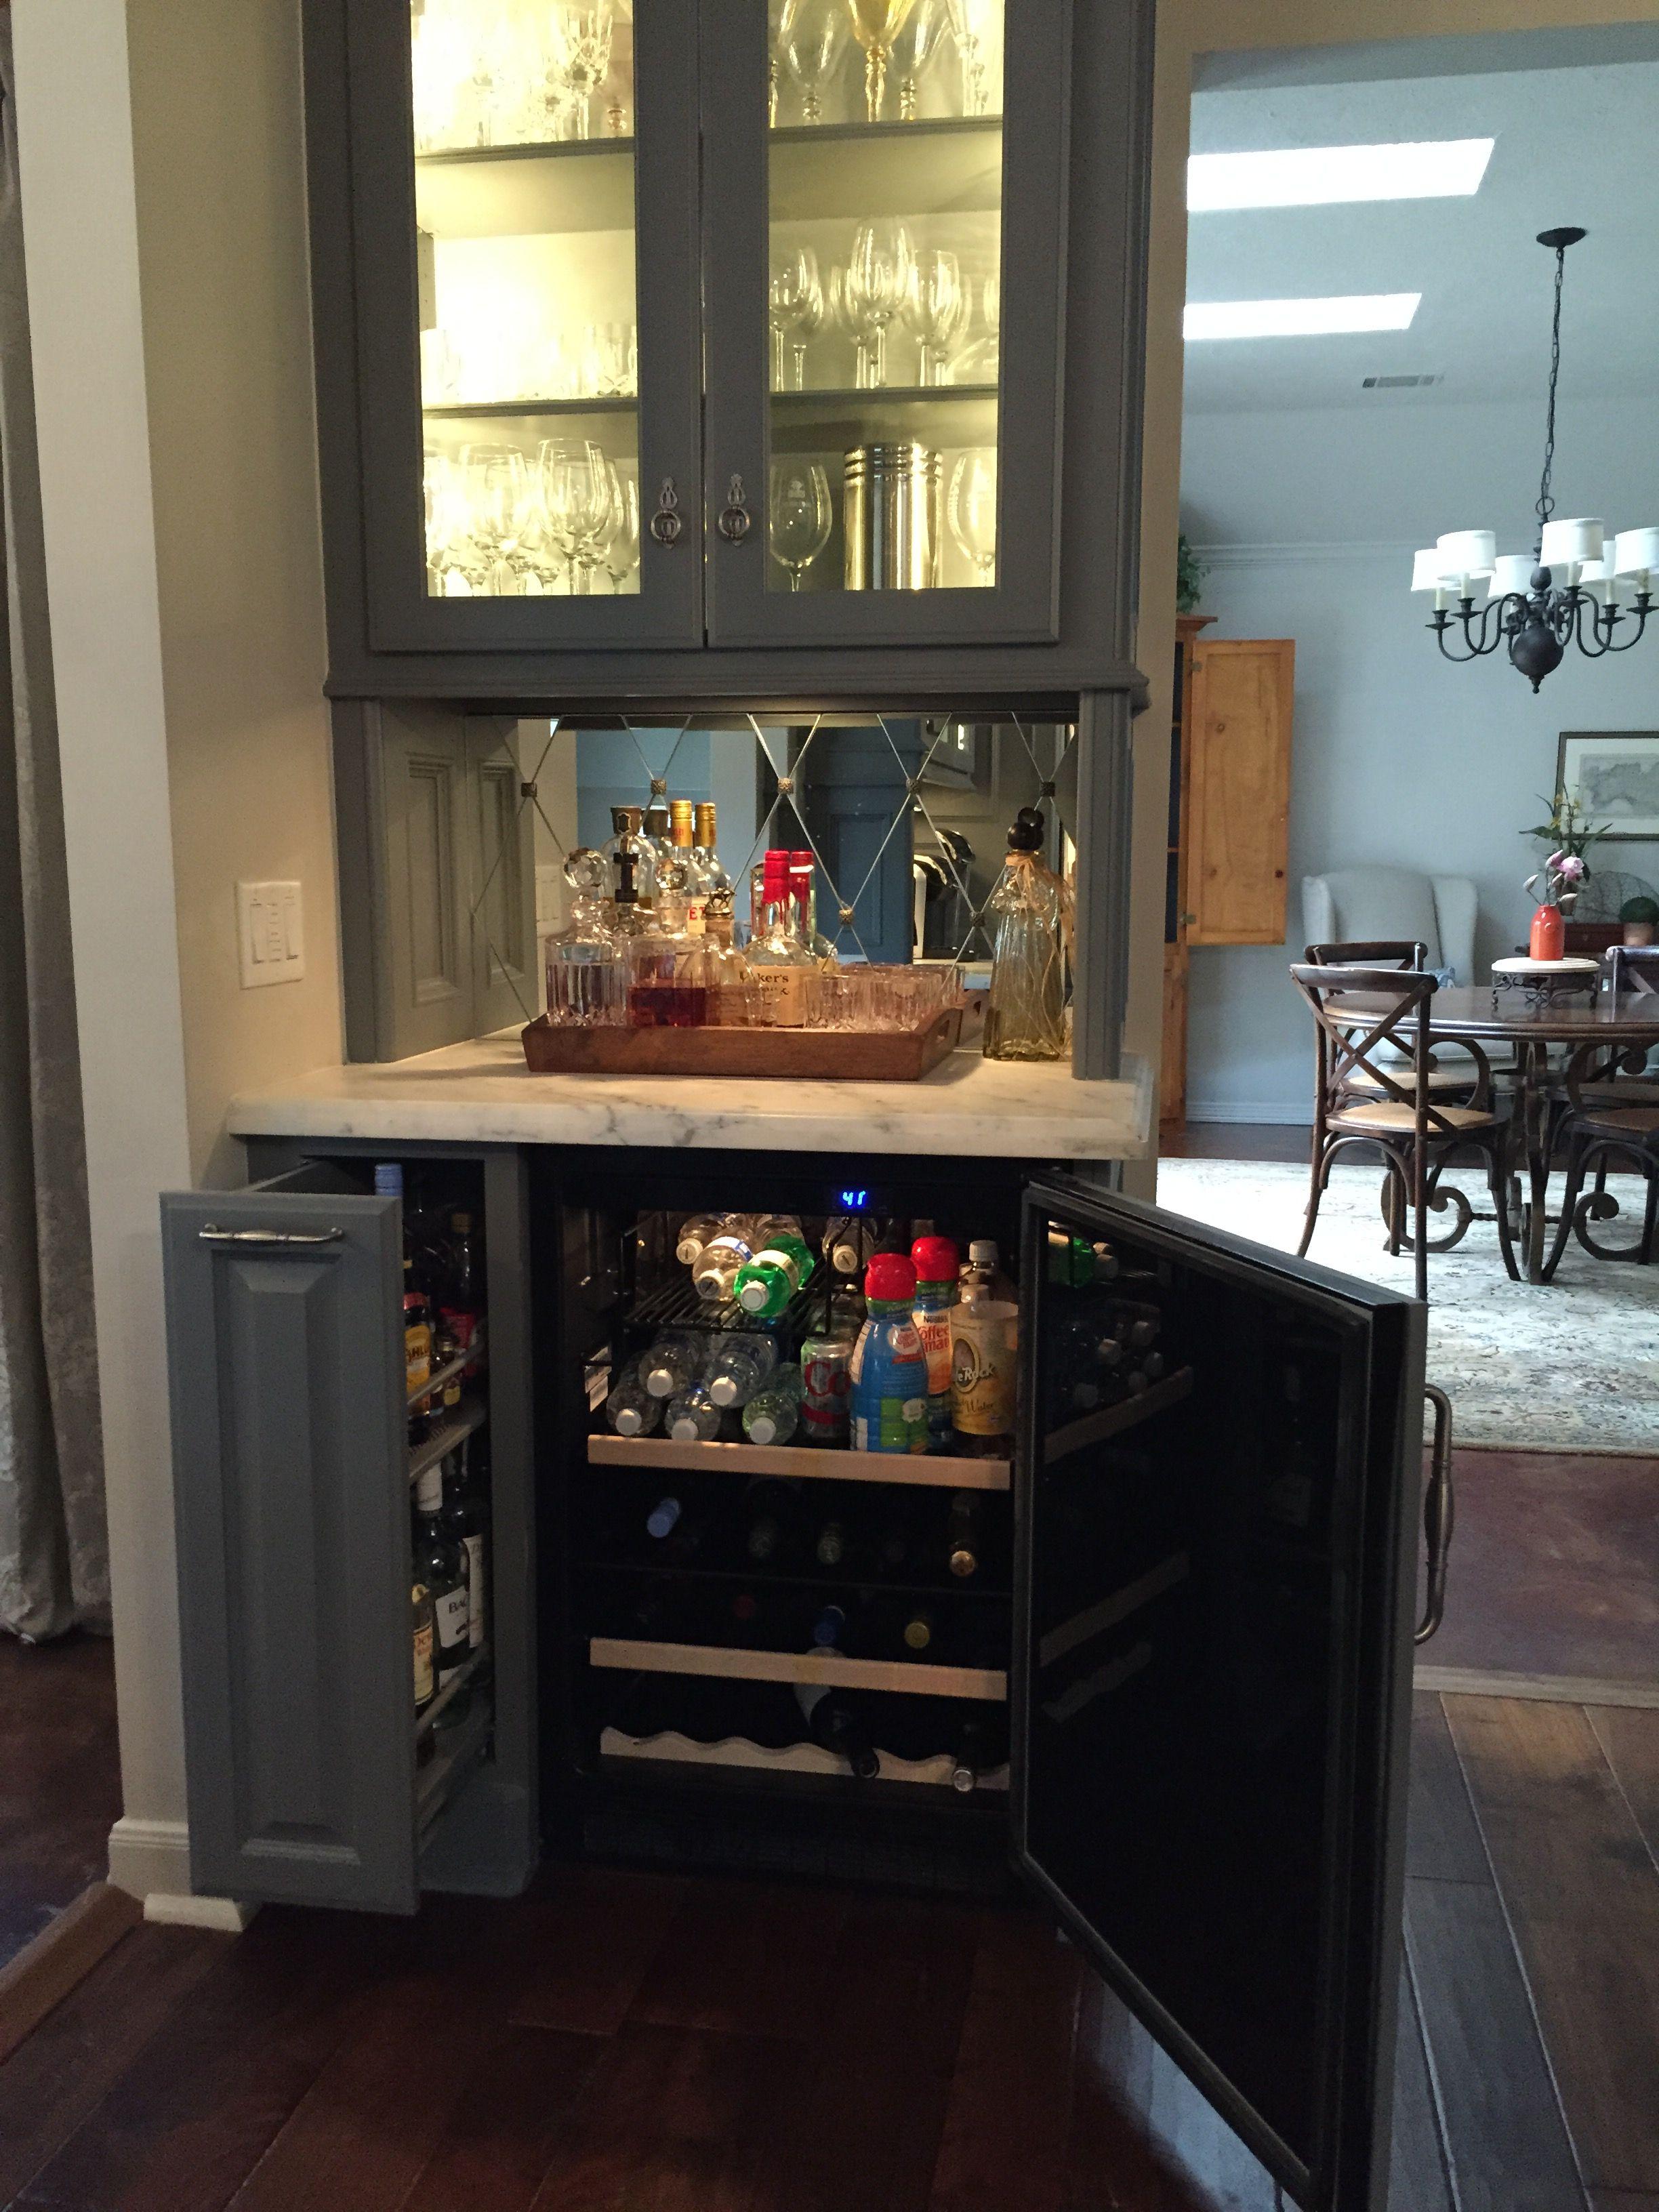 My Kitchen Liquor Pullout And Beverage Fridge